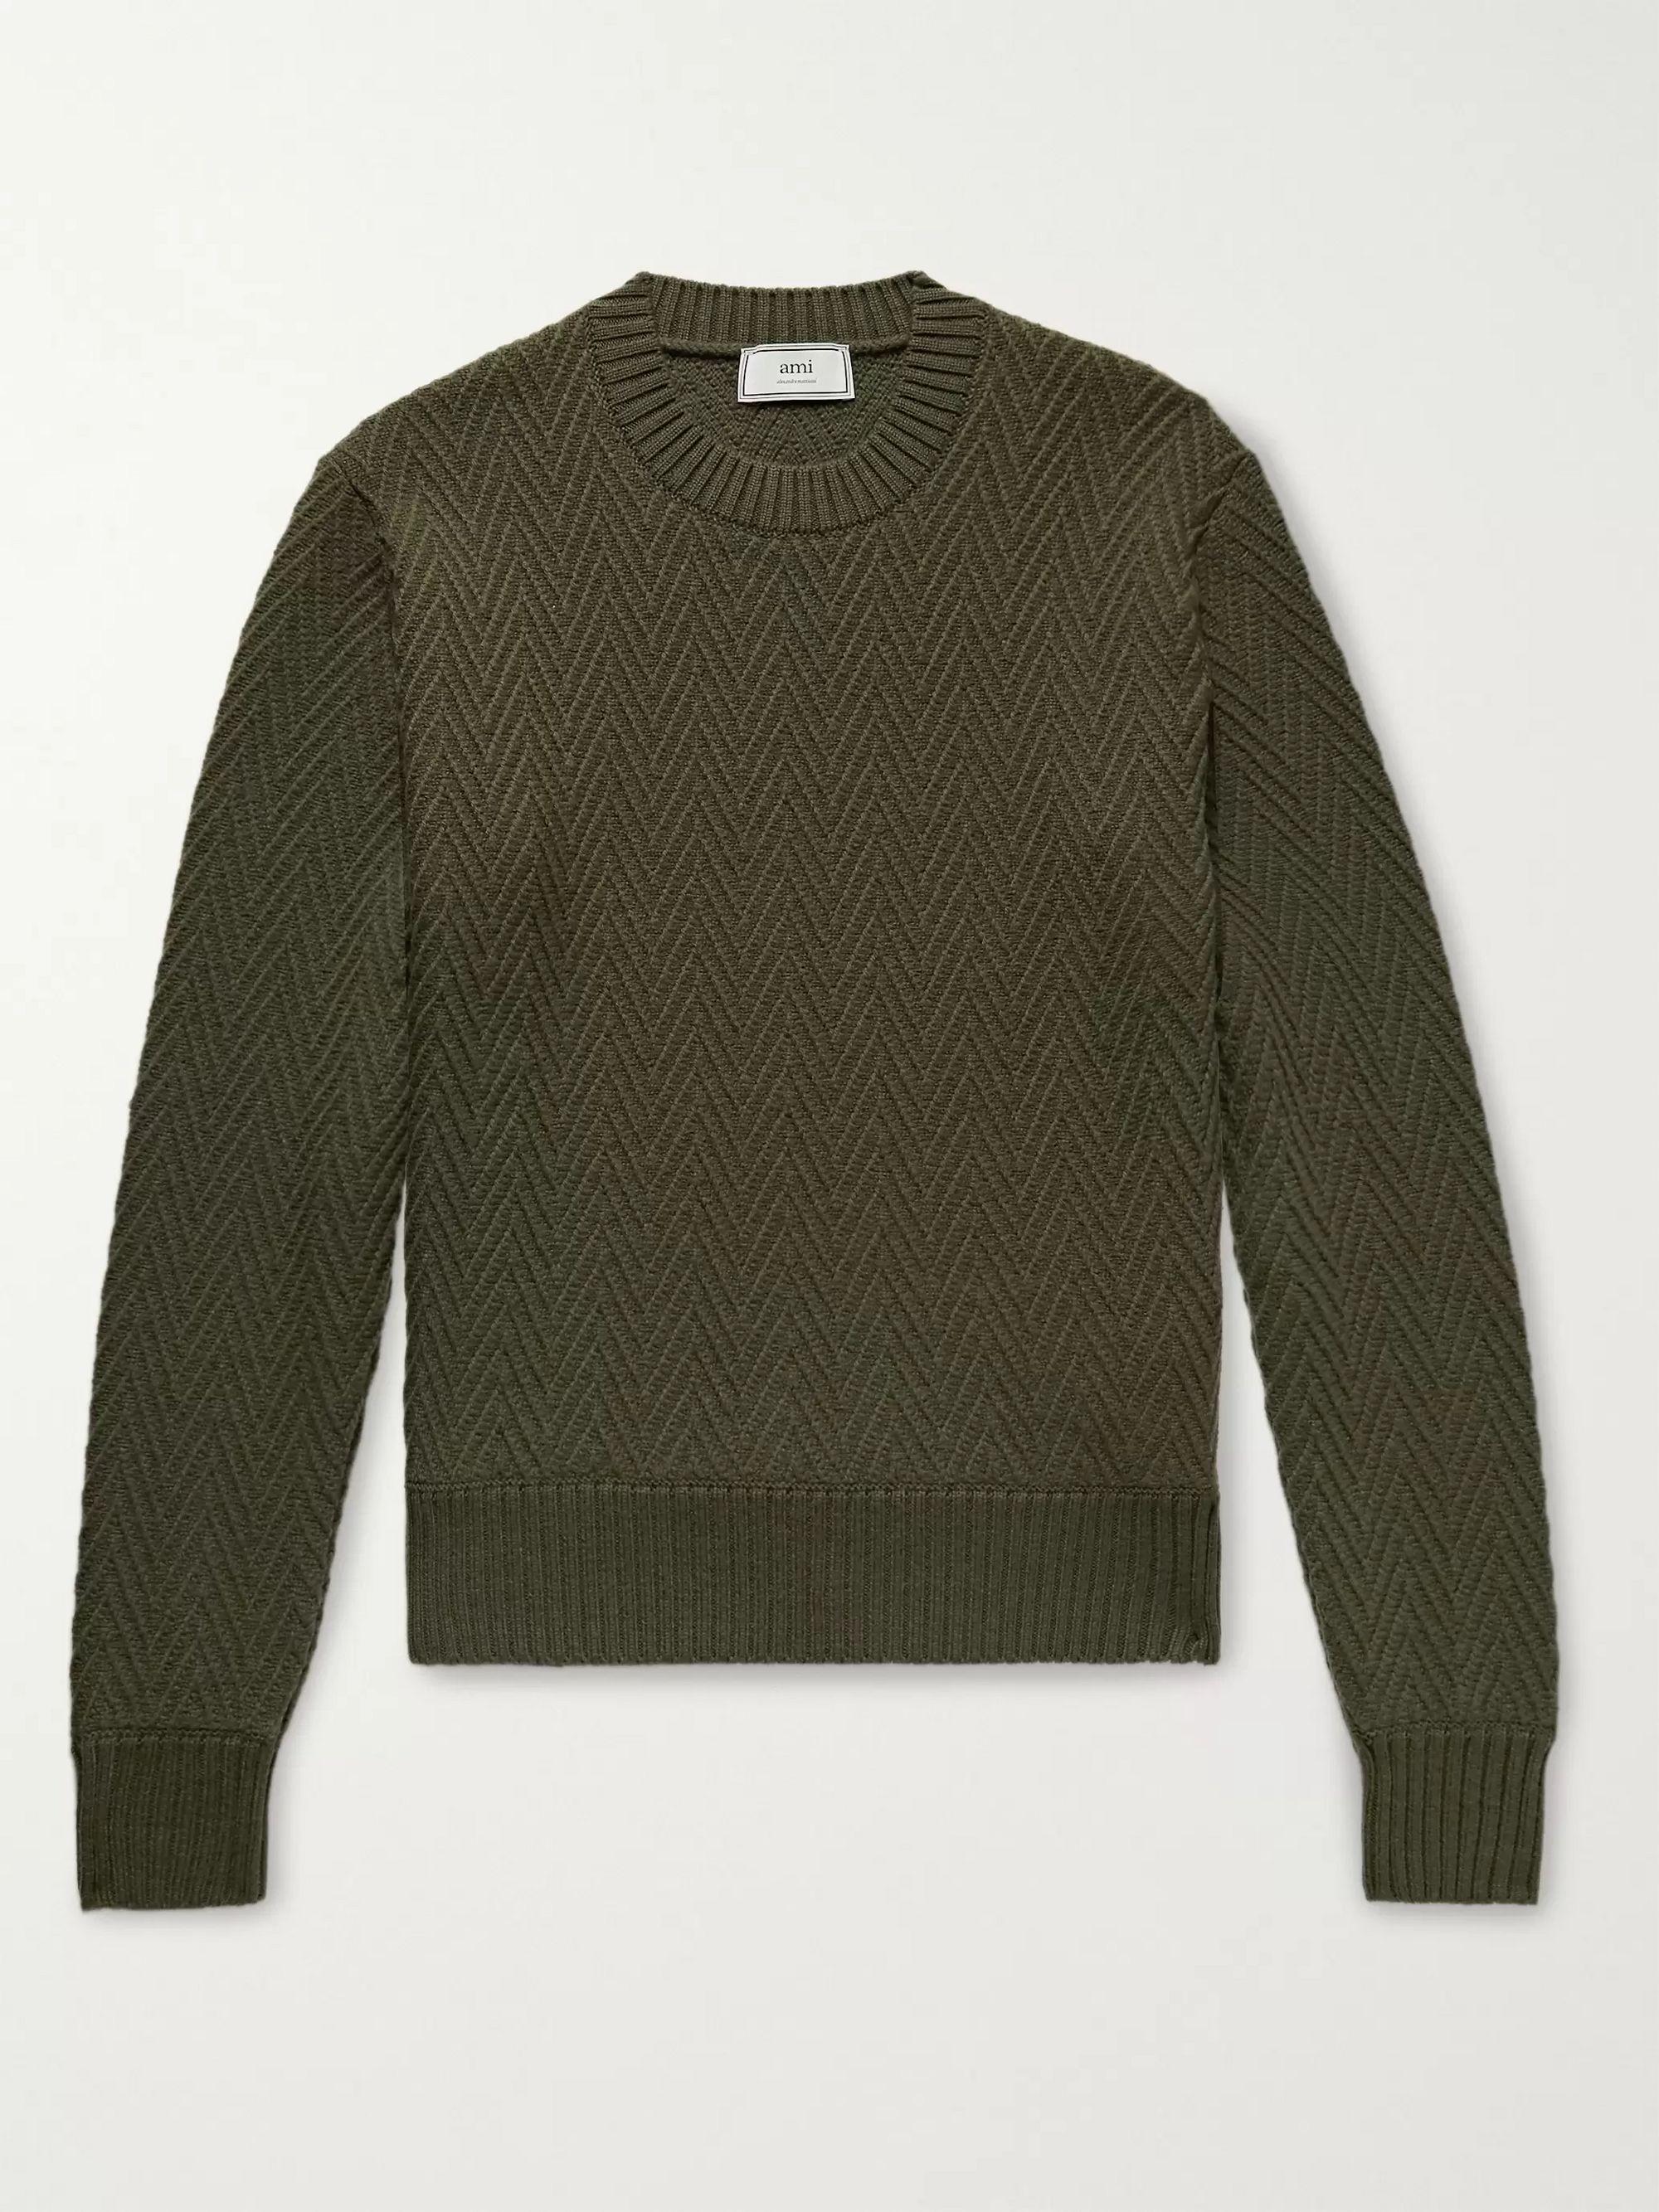 AMI Green Slim-Fit Herringbone Wool Sweater,Green